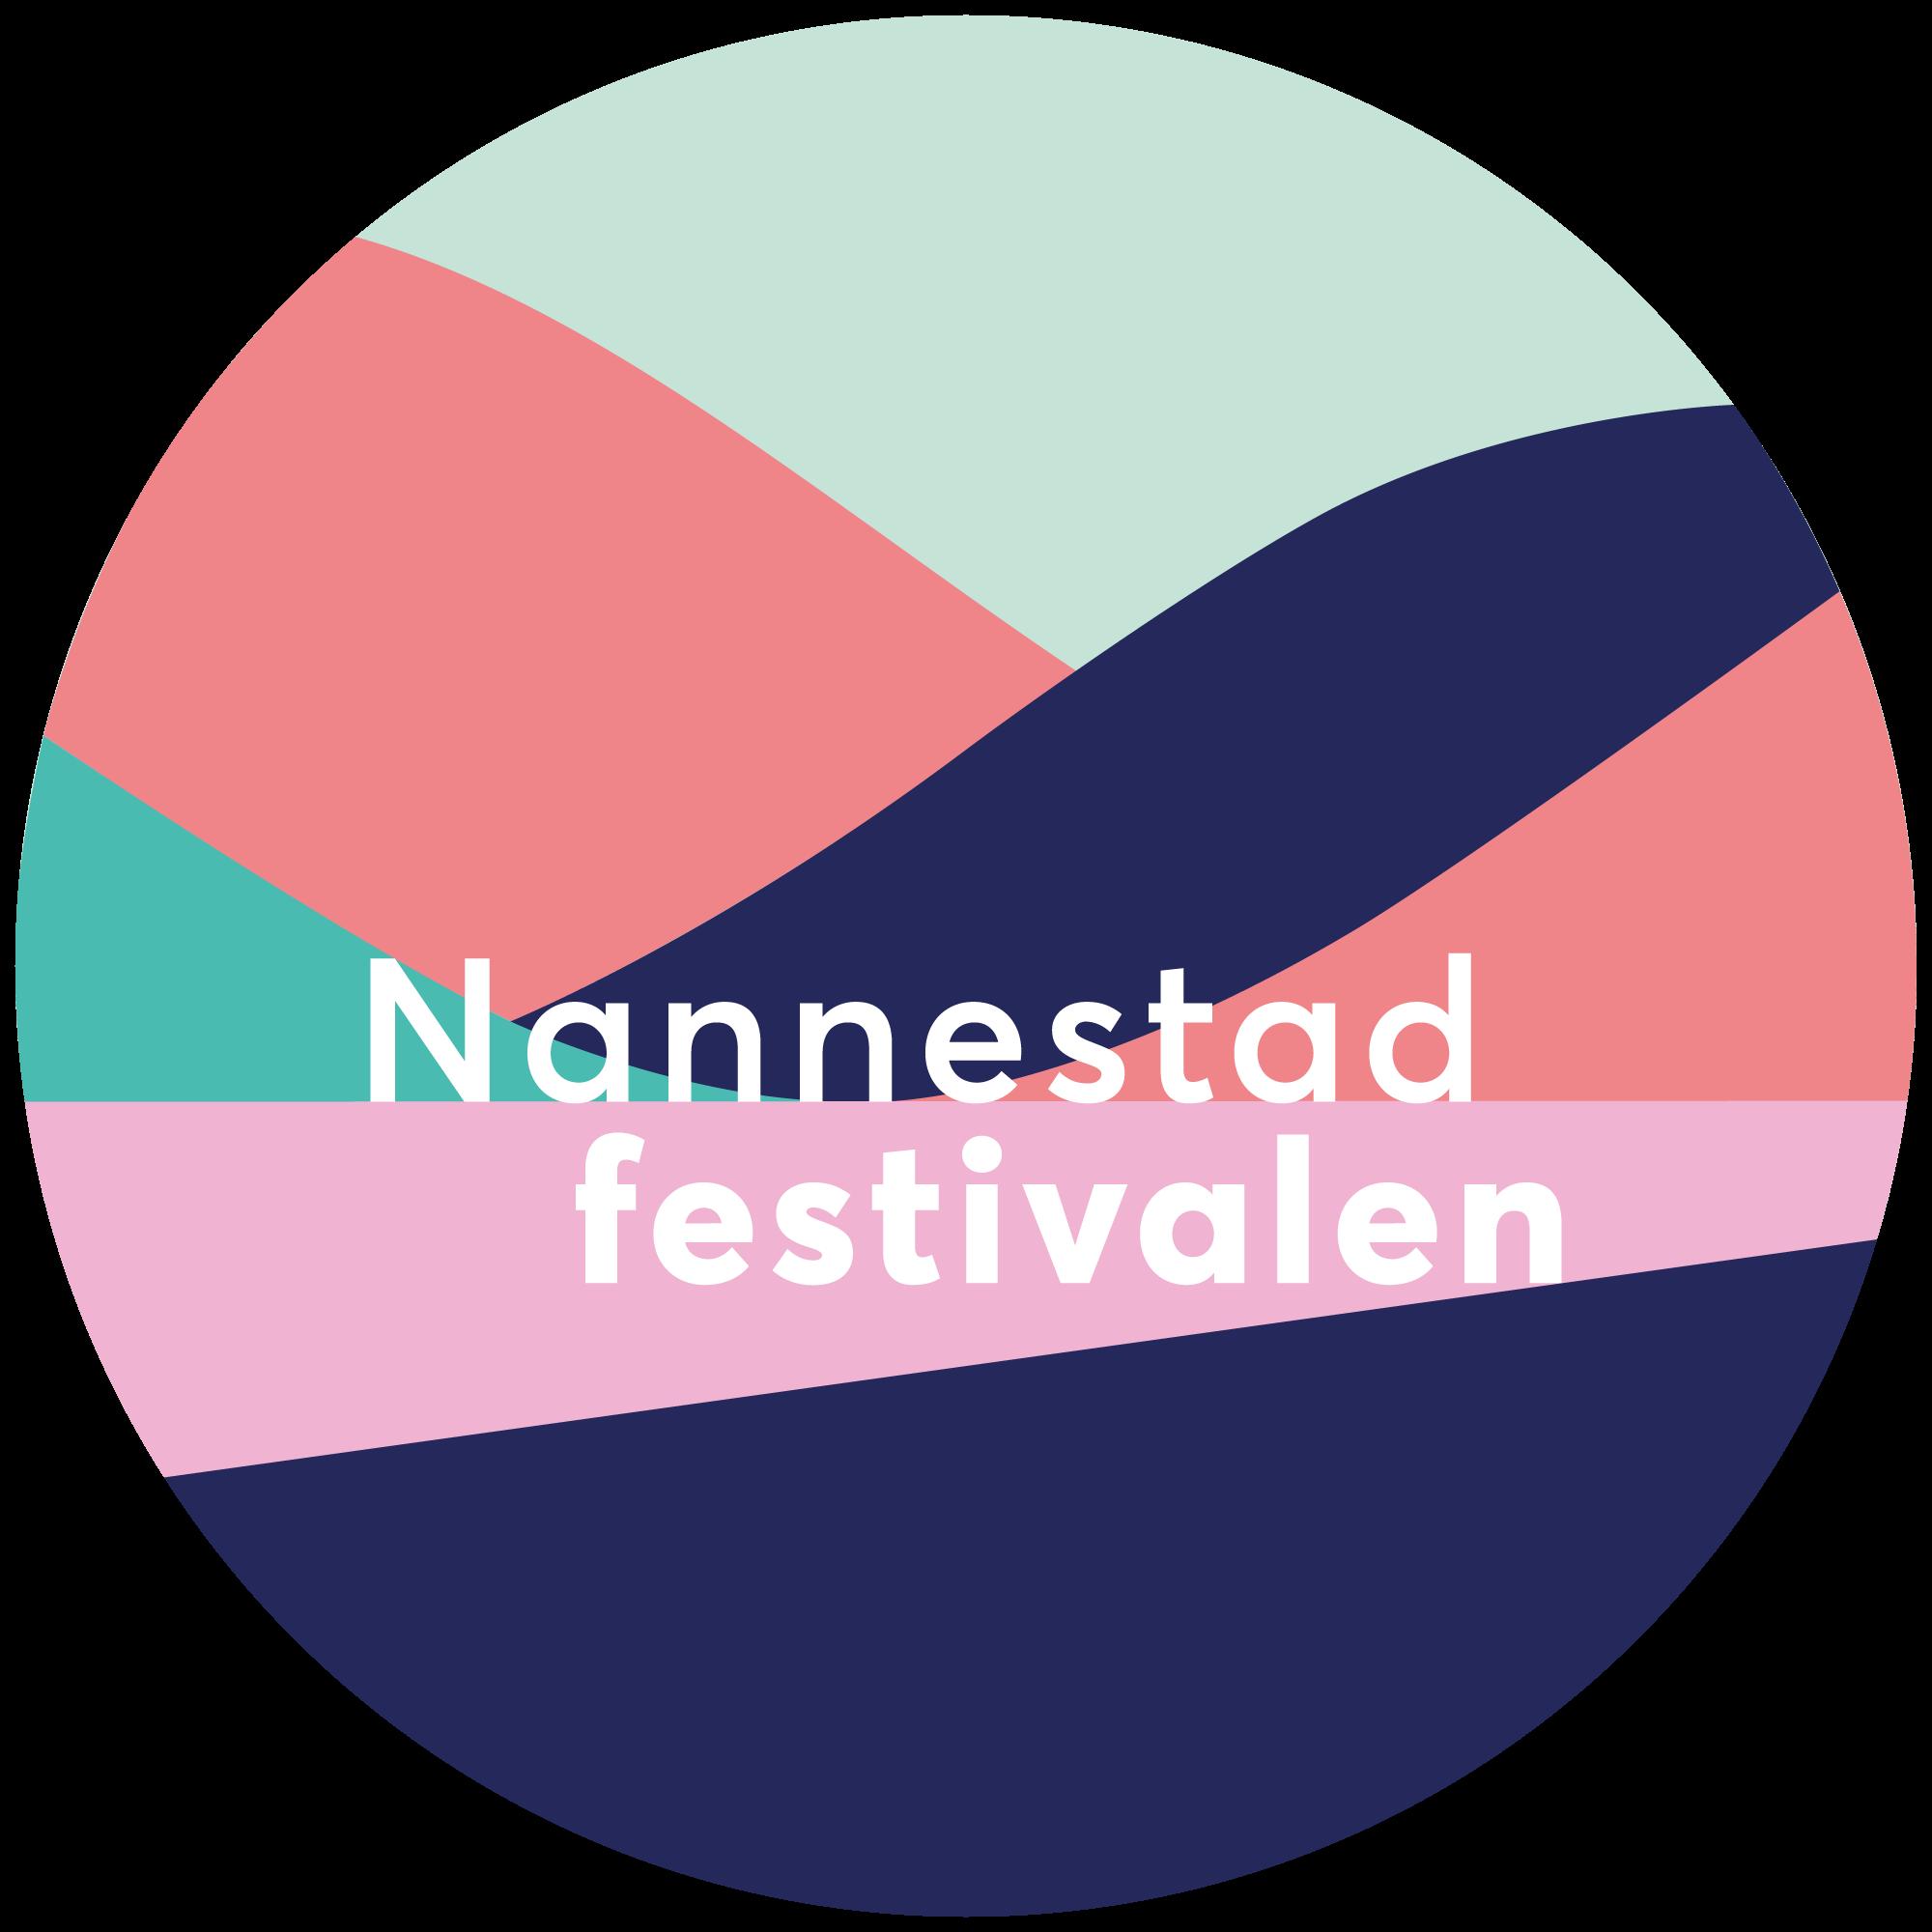 Nannestadfestivalen-logo